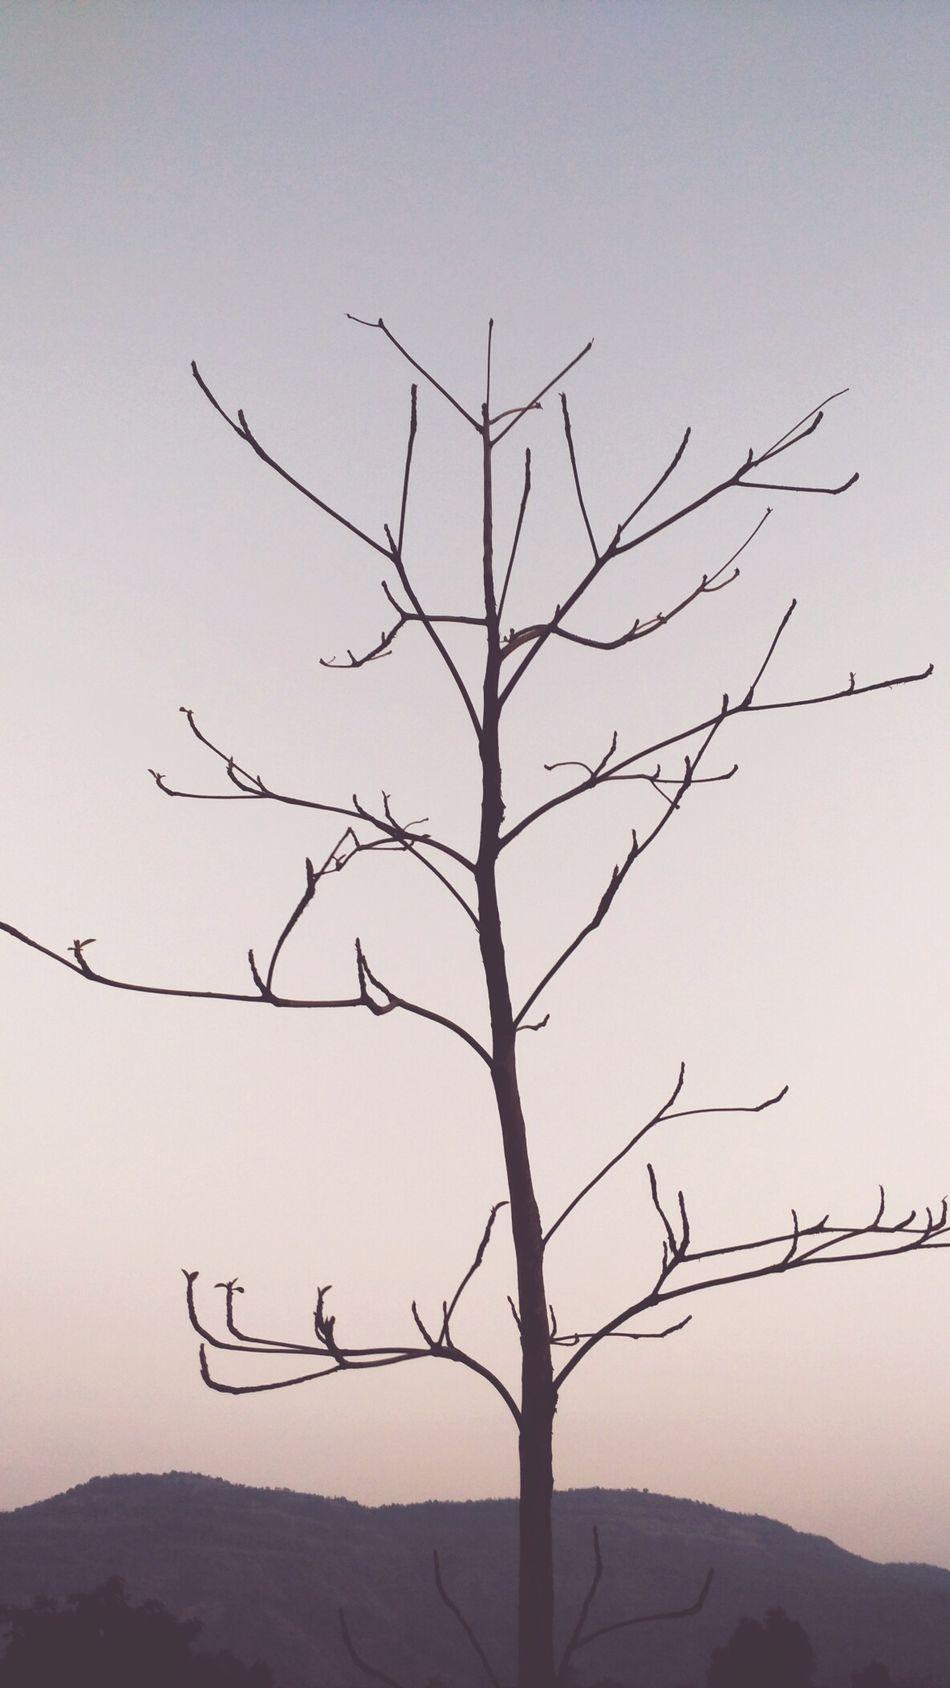 Tree Mobile Photography Mi4i Evening Pdphotography